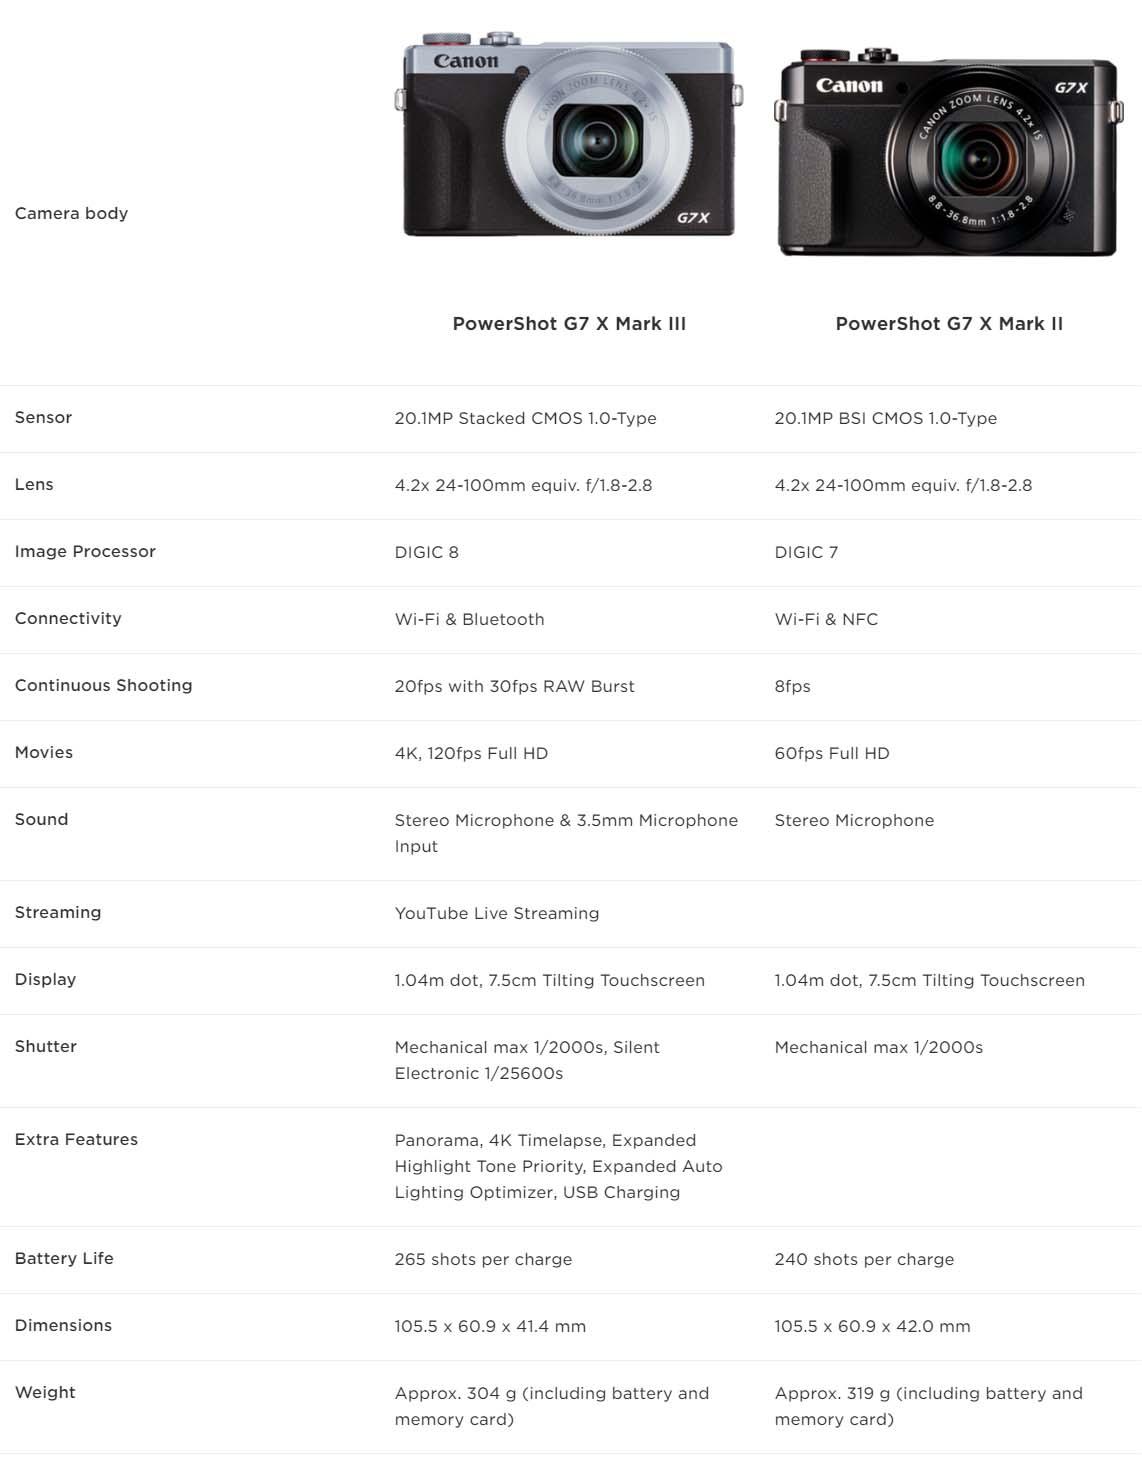 perbandingan Canon PowerShot G7 X Mark III denga seri sebelumnya